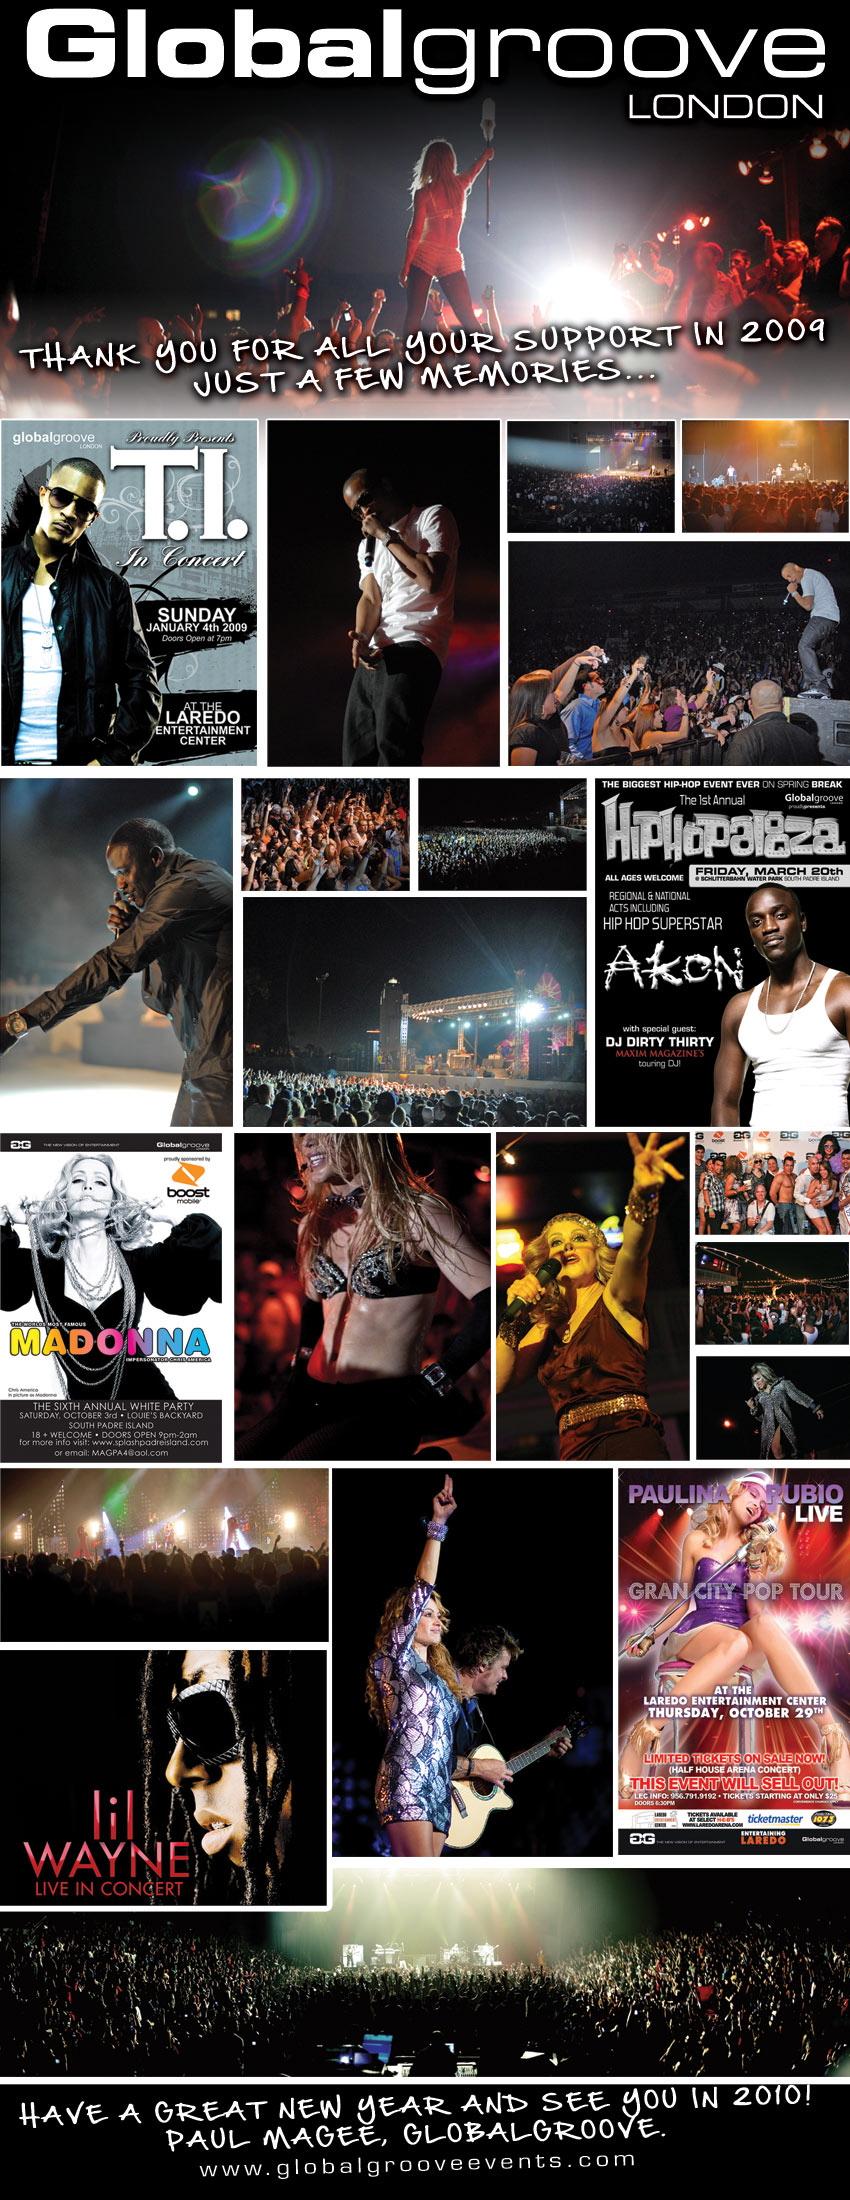 Madonna Impersonator